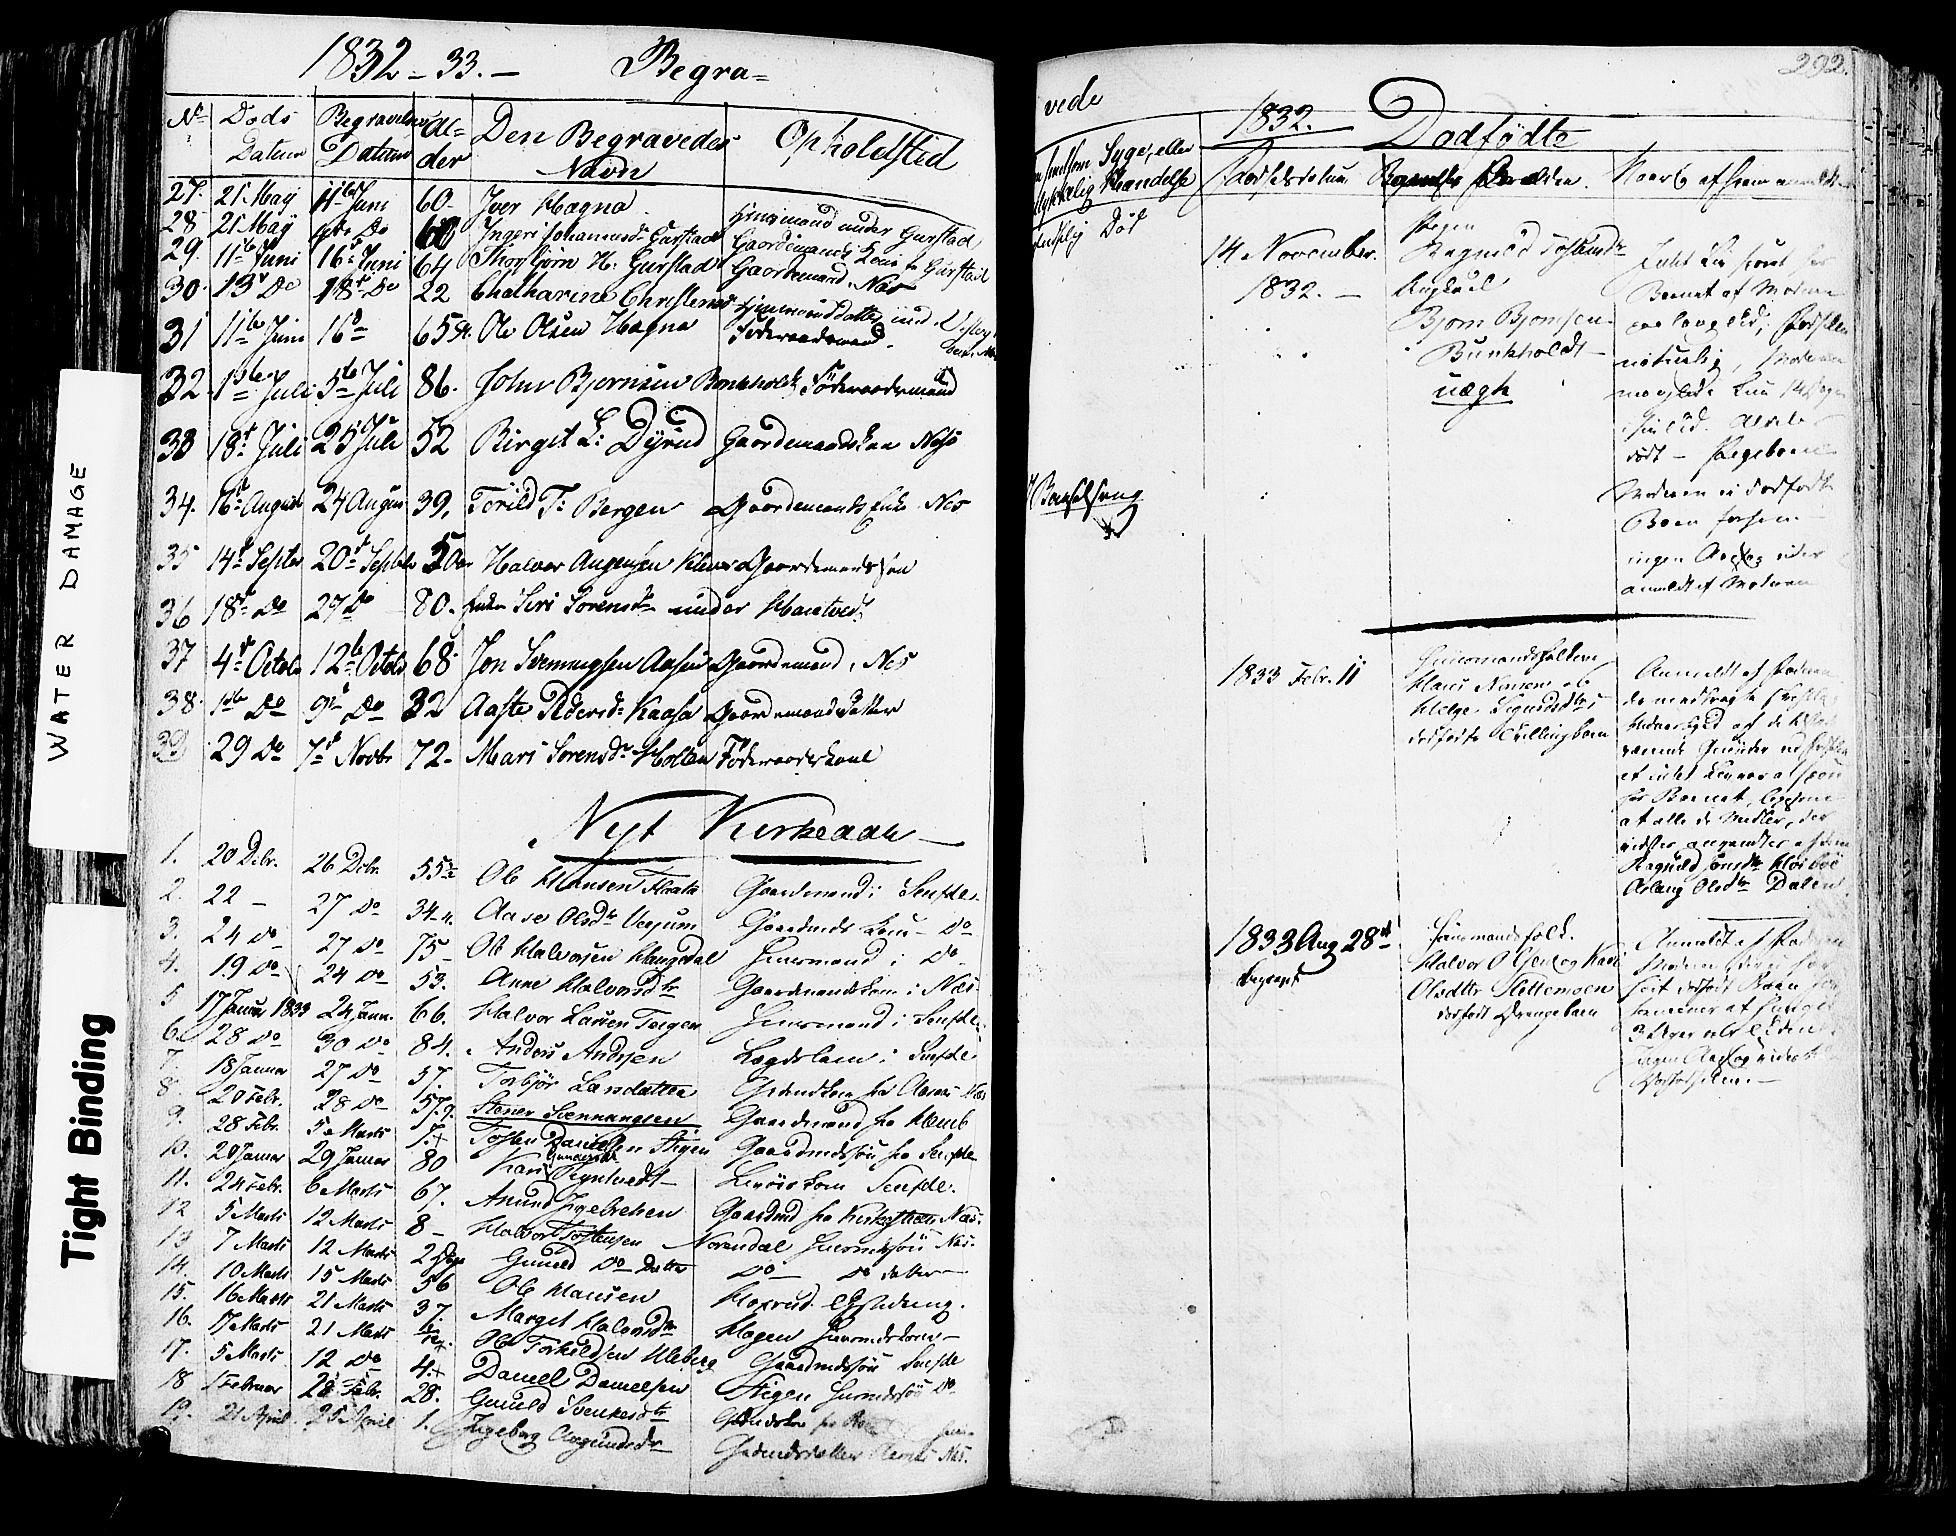 SAKO, Sauherad kirkebøker, F/Fa/L0006: Ministerialbok nr. I 6, 1827-1850, s. 292